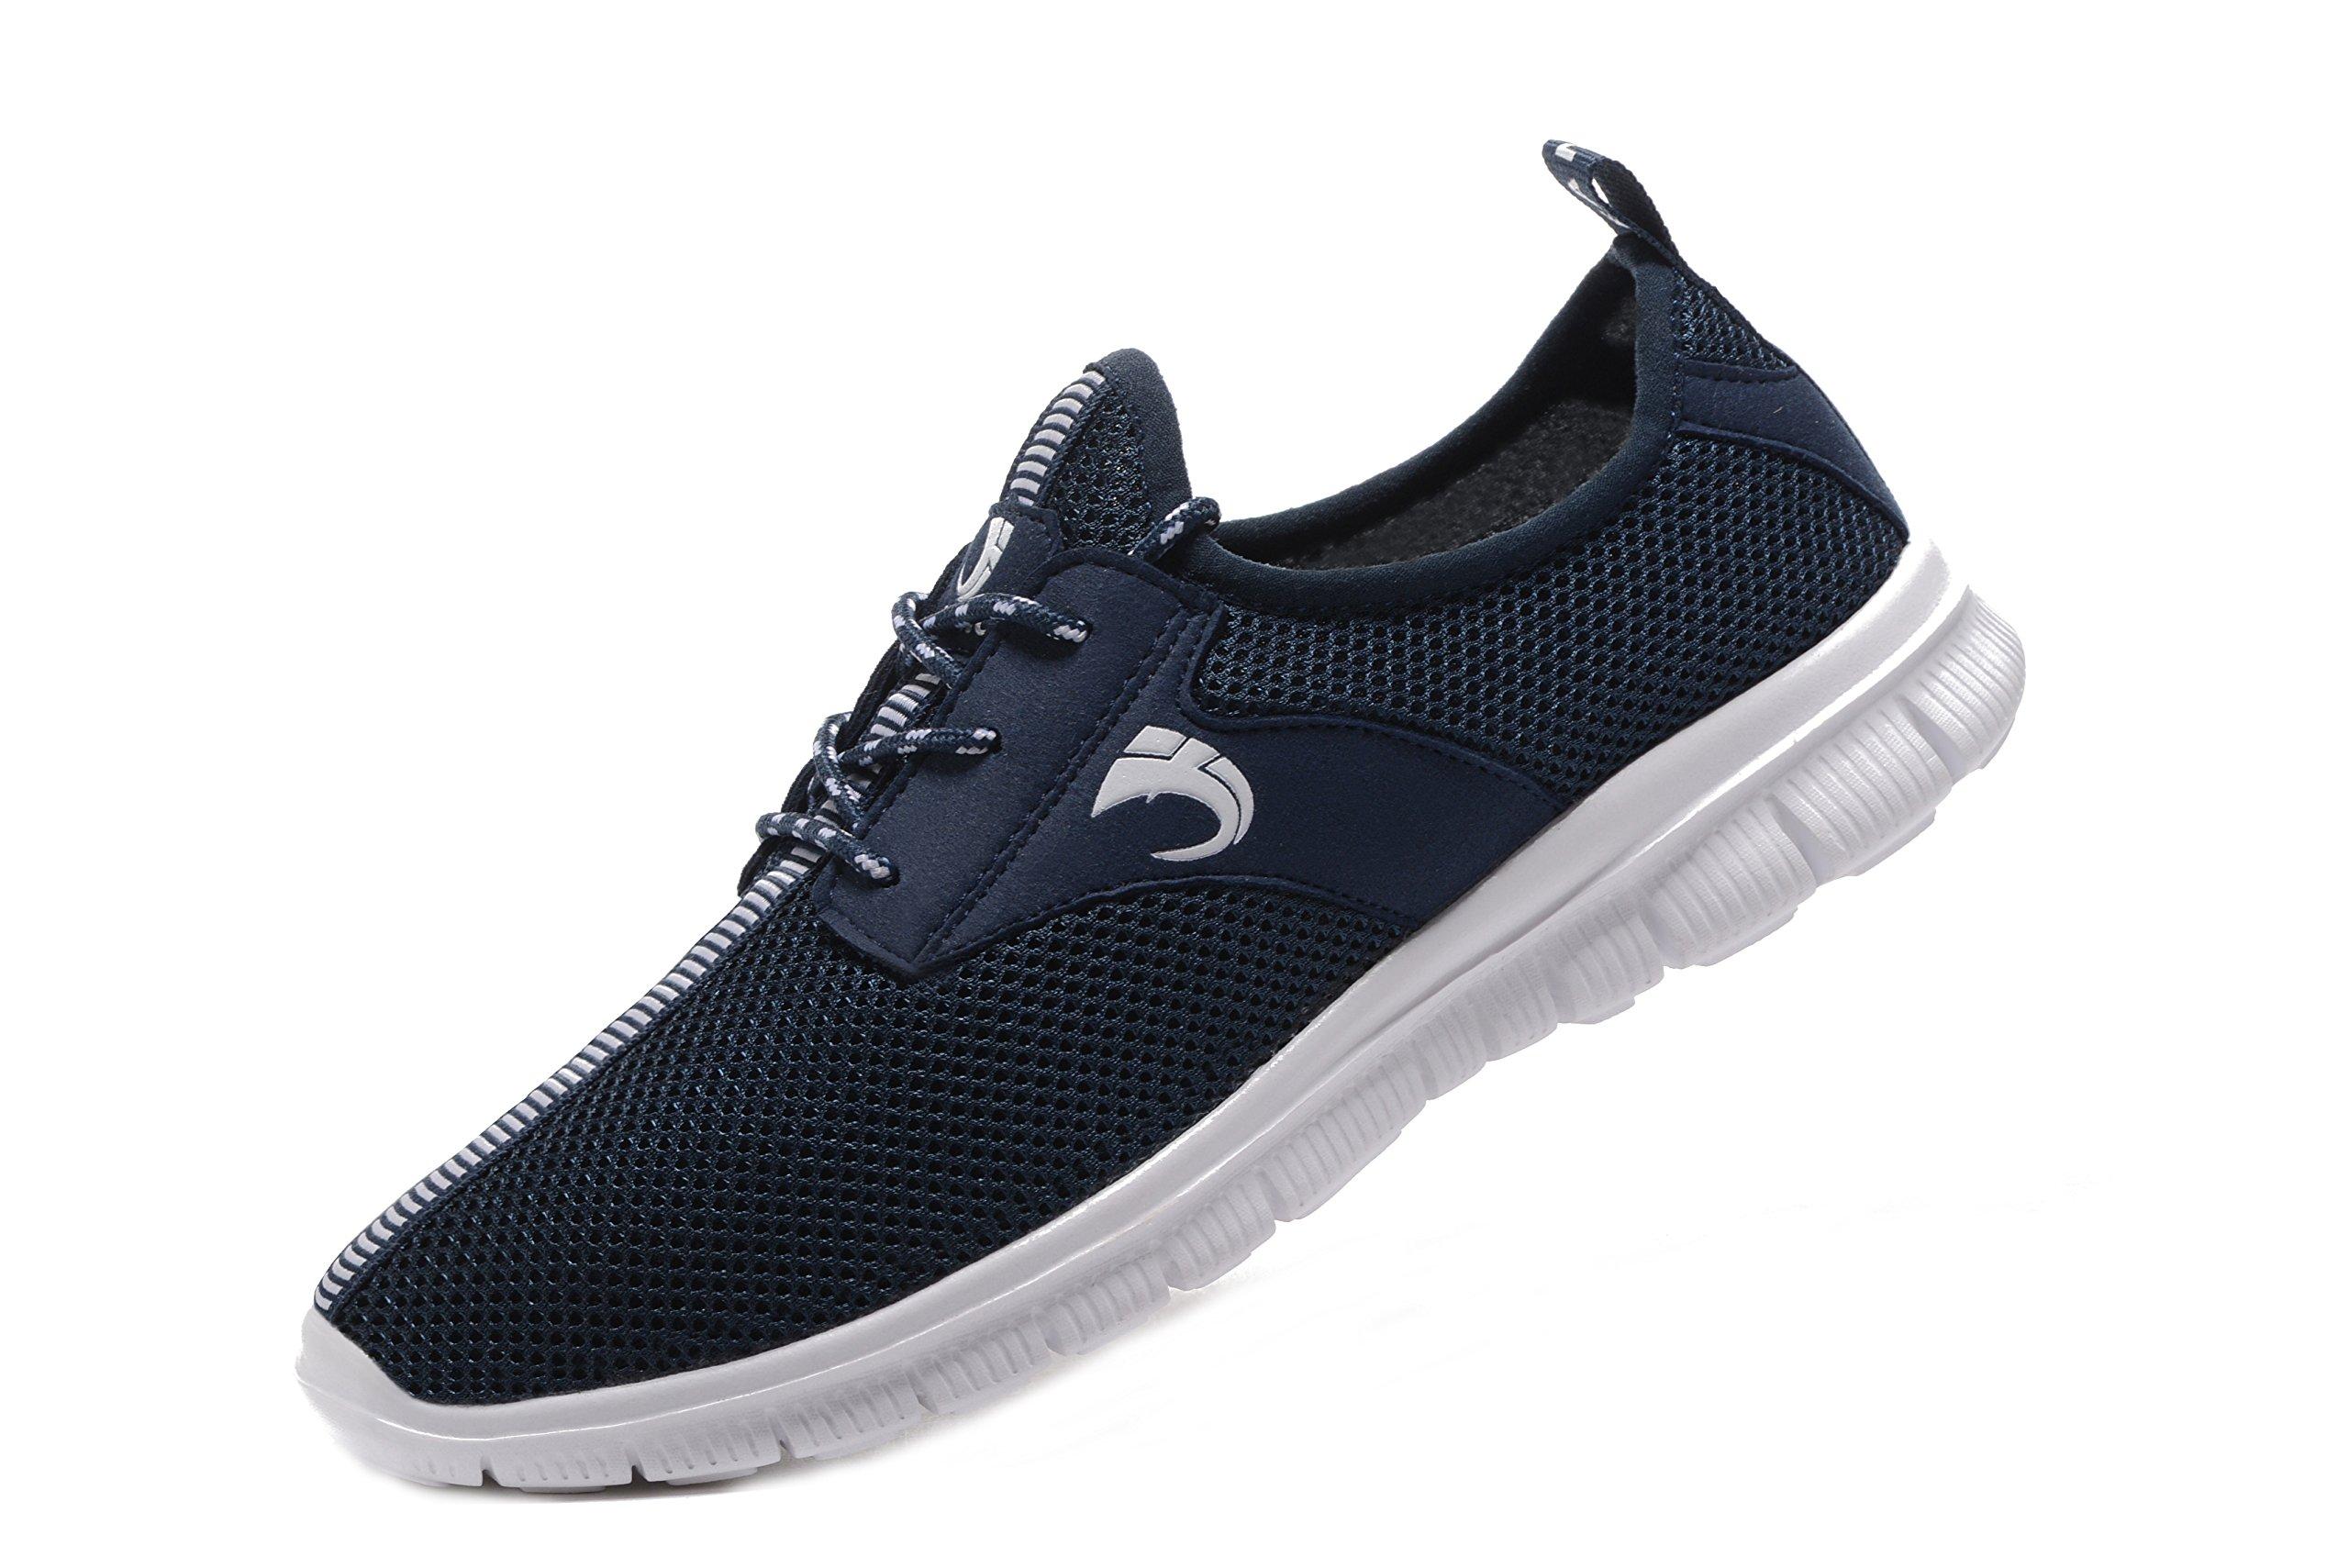 FANIC Men's Walking Shoes Workout Shoes Full Mesh Running Shoes Lightweight Comfortable Fitness Breathable Casual Sneaker (9.5US/43EU,Men, Blue)¡